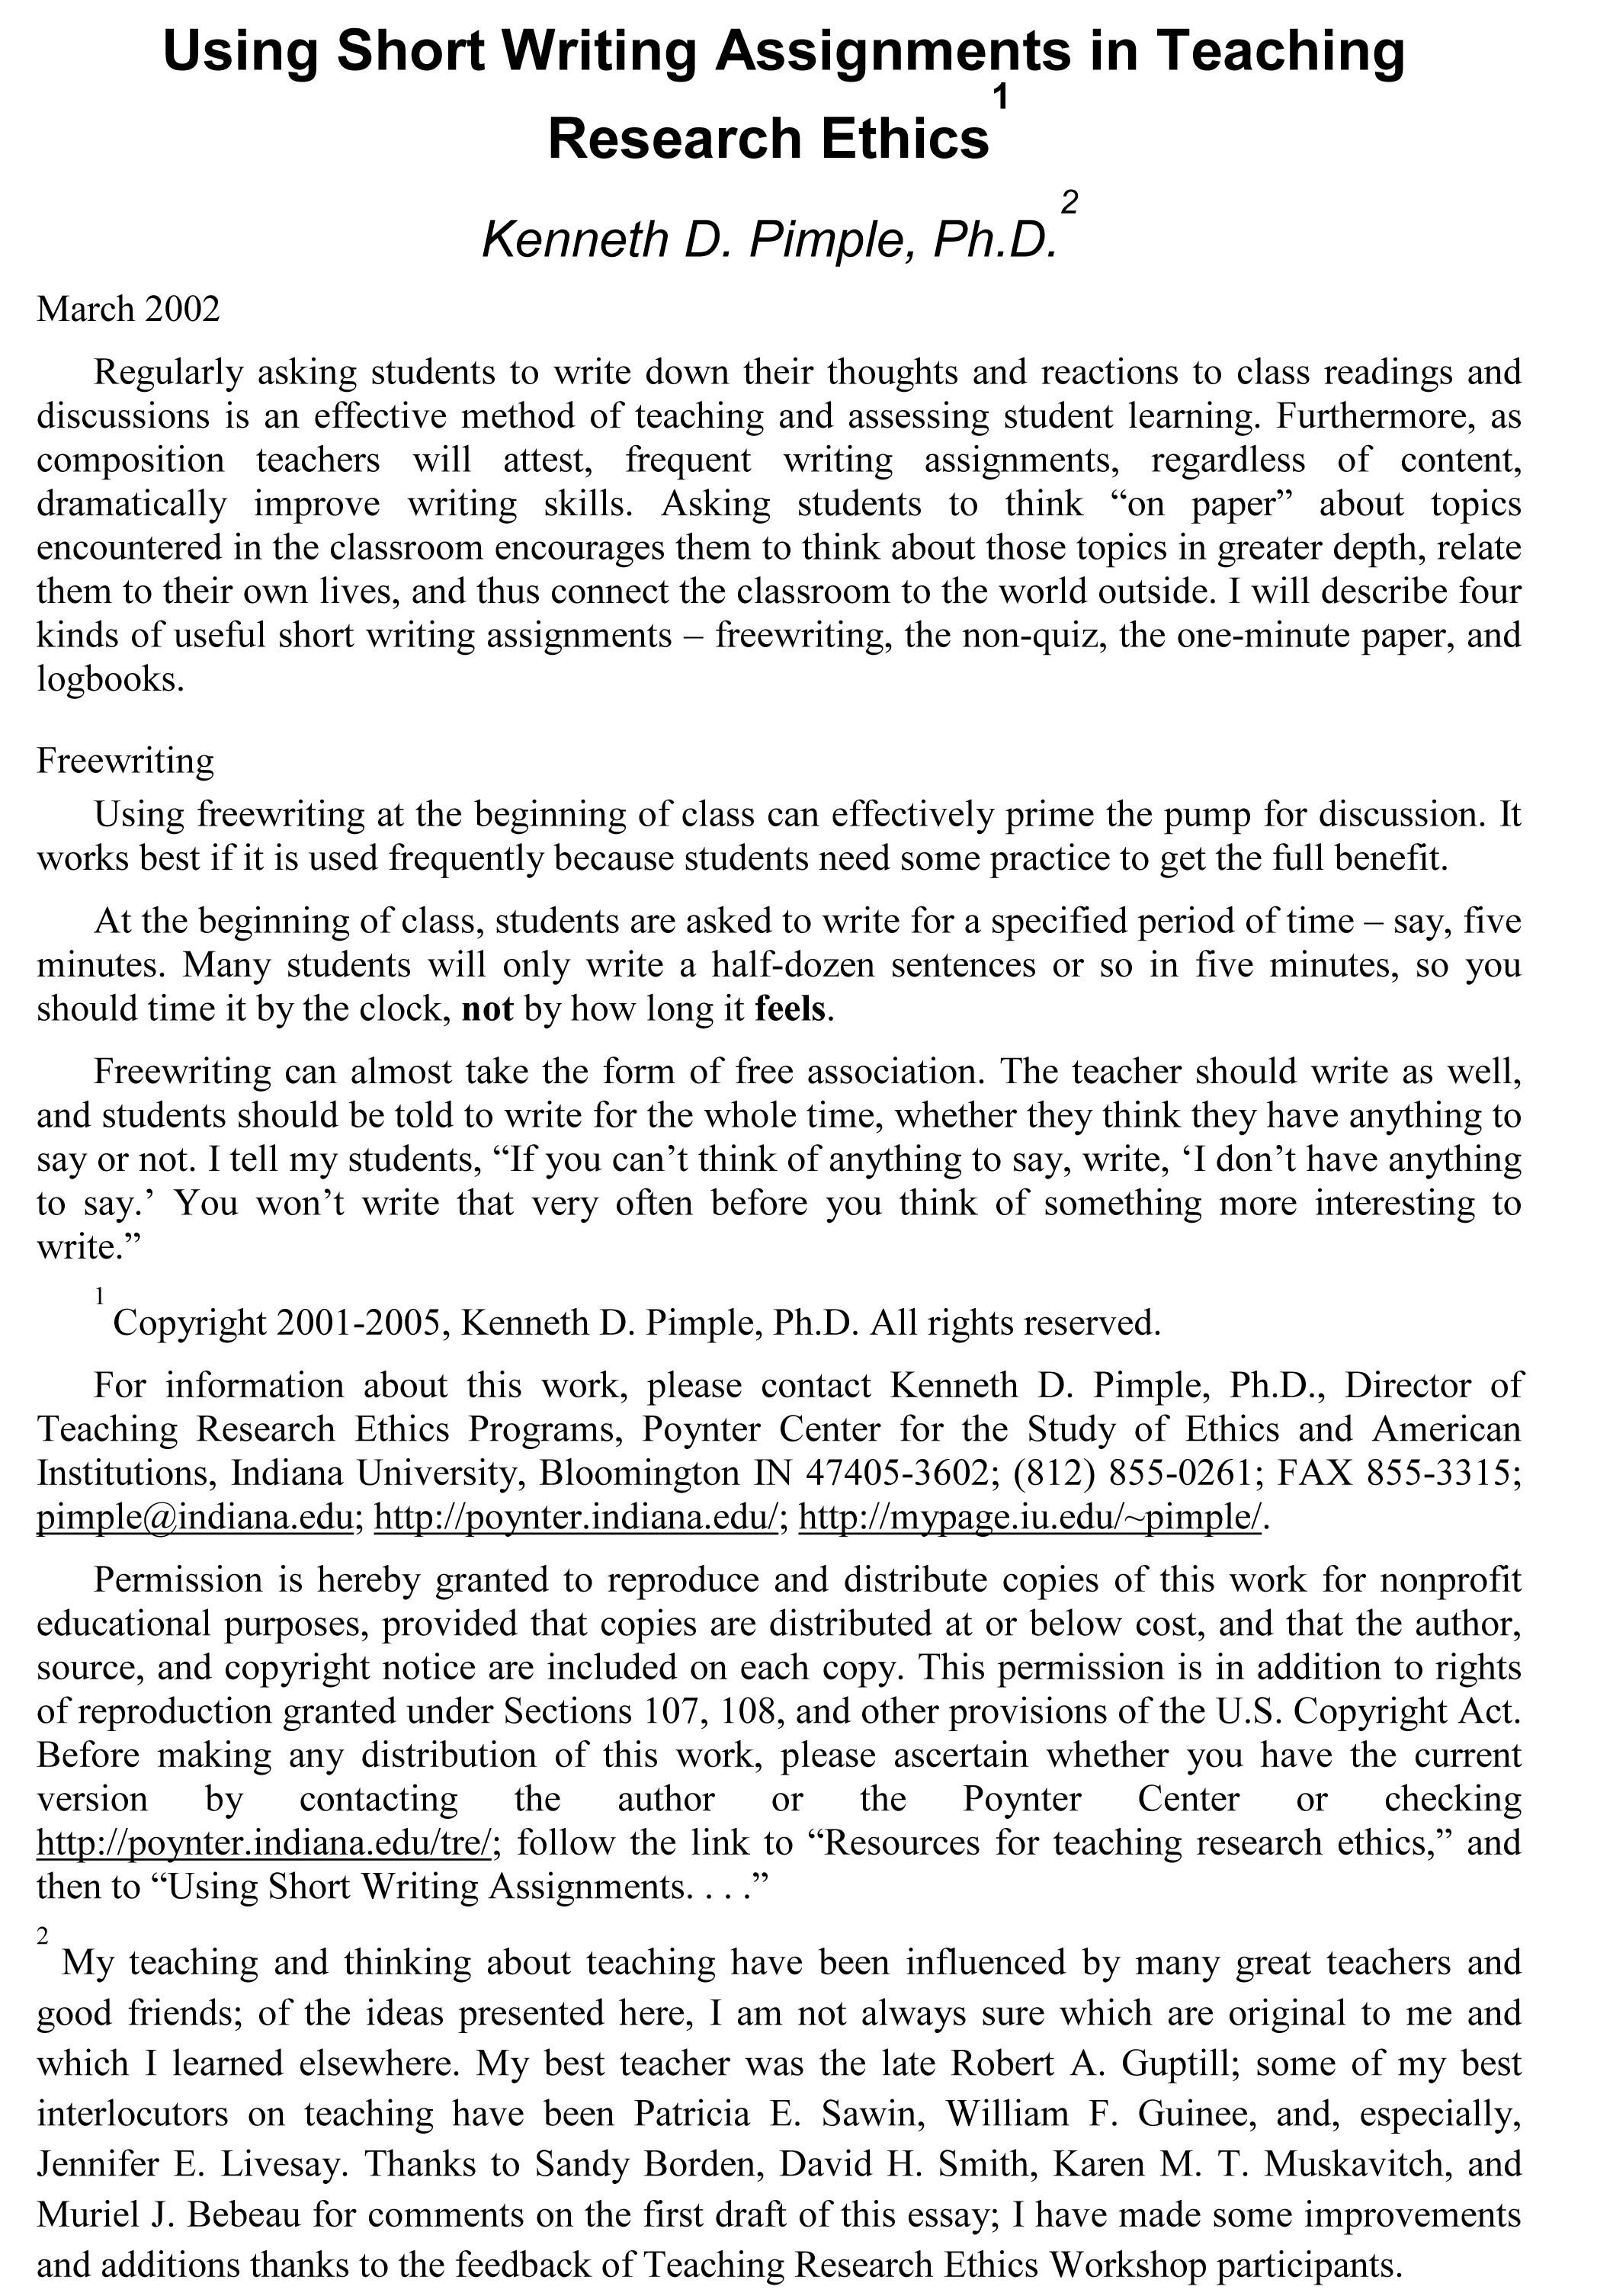 012 Essay Example College Level Argumentative Sample Best Of How To Write Essays Kairo Exceptional Persuasive Examples Topics Full